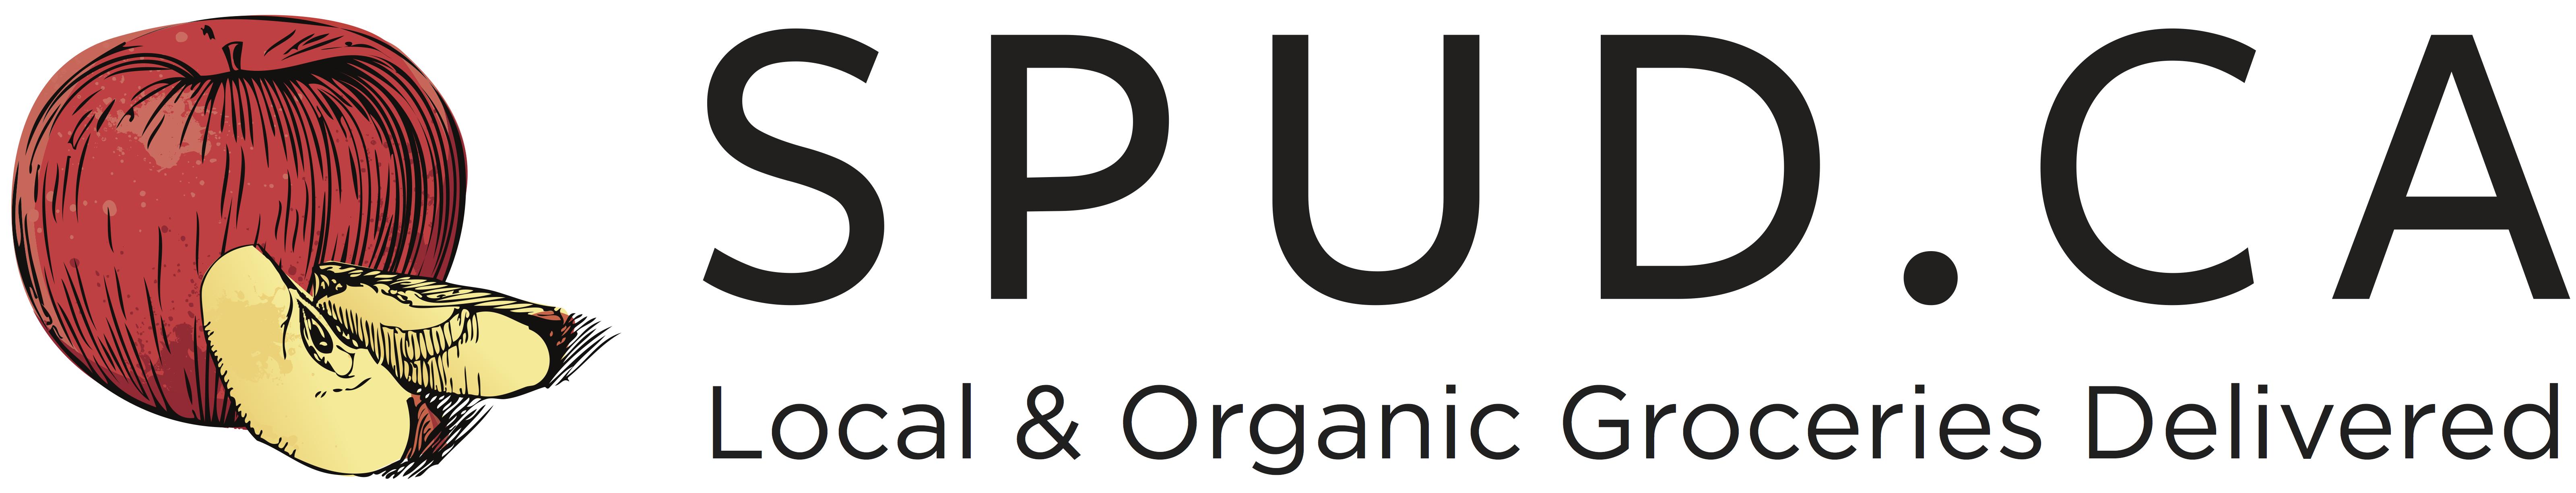 SPUDCA_Logo_Horizontal_Tagline_CYMK_Colour